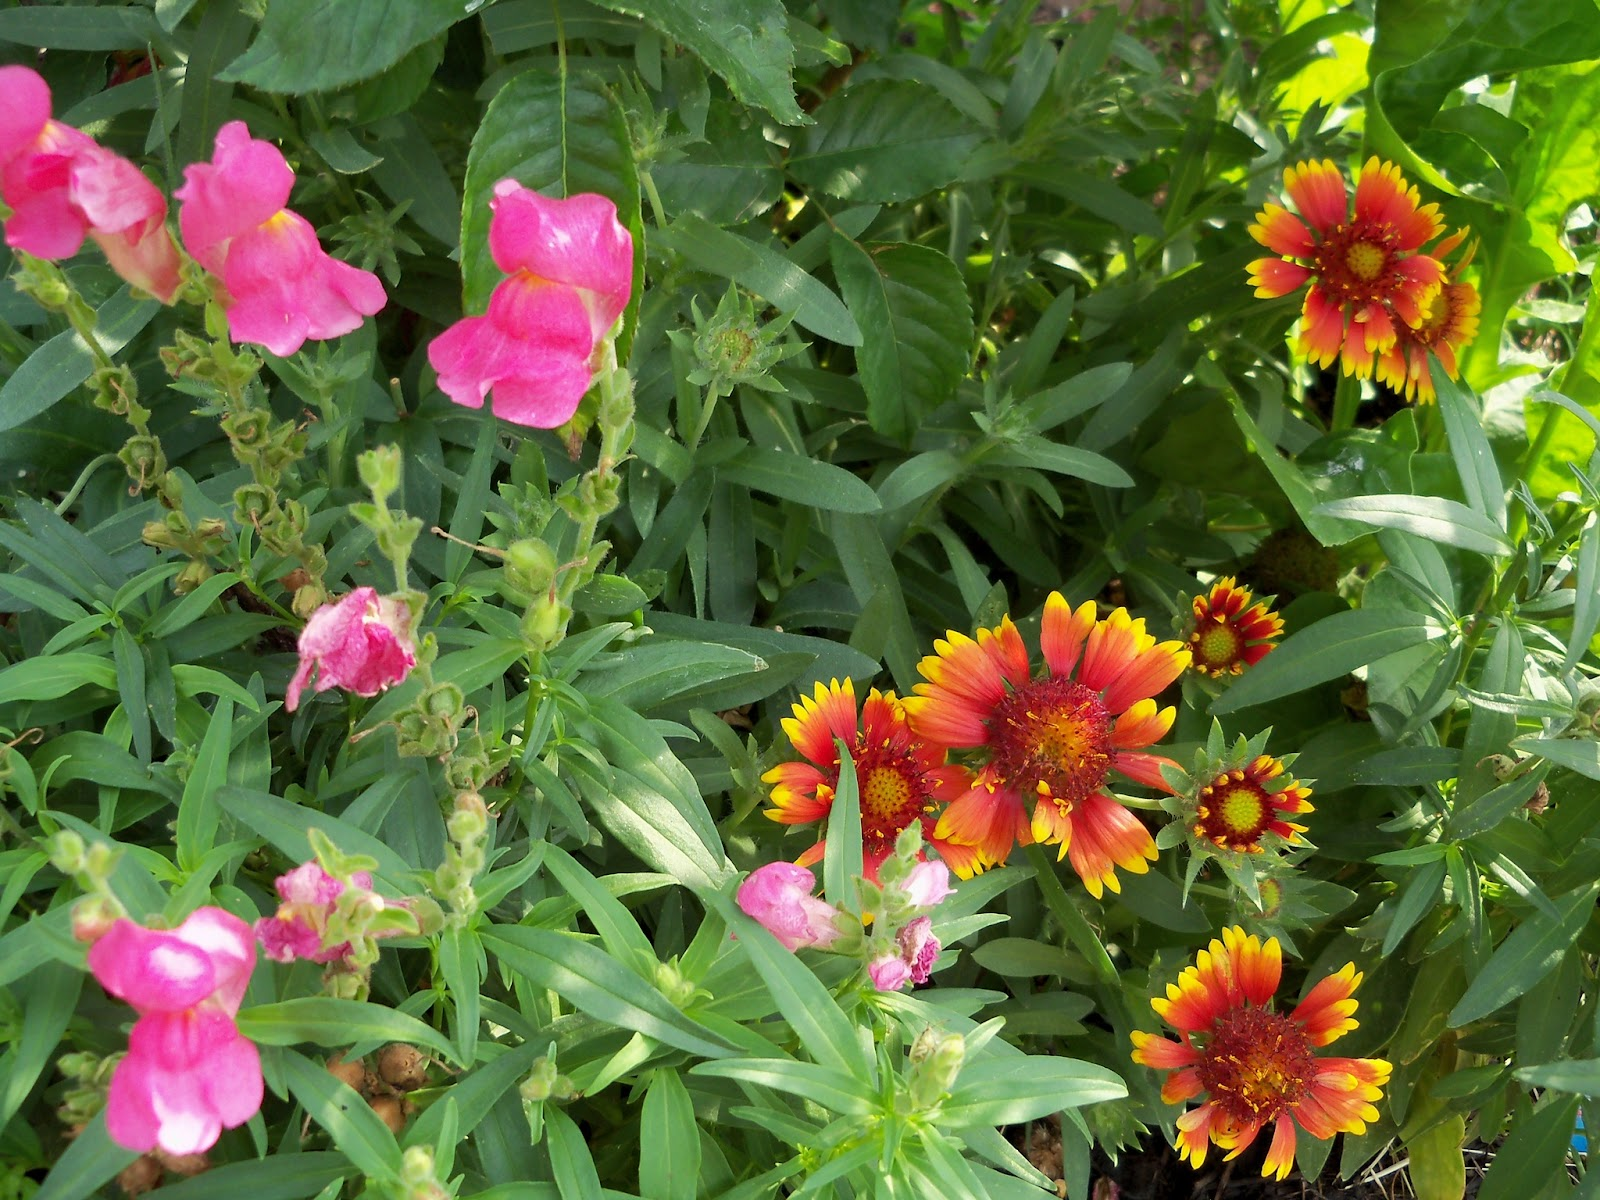 Gardening 2011 - 100_8565.JPG